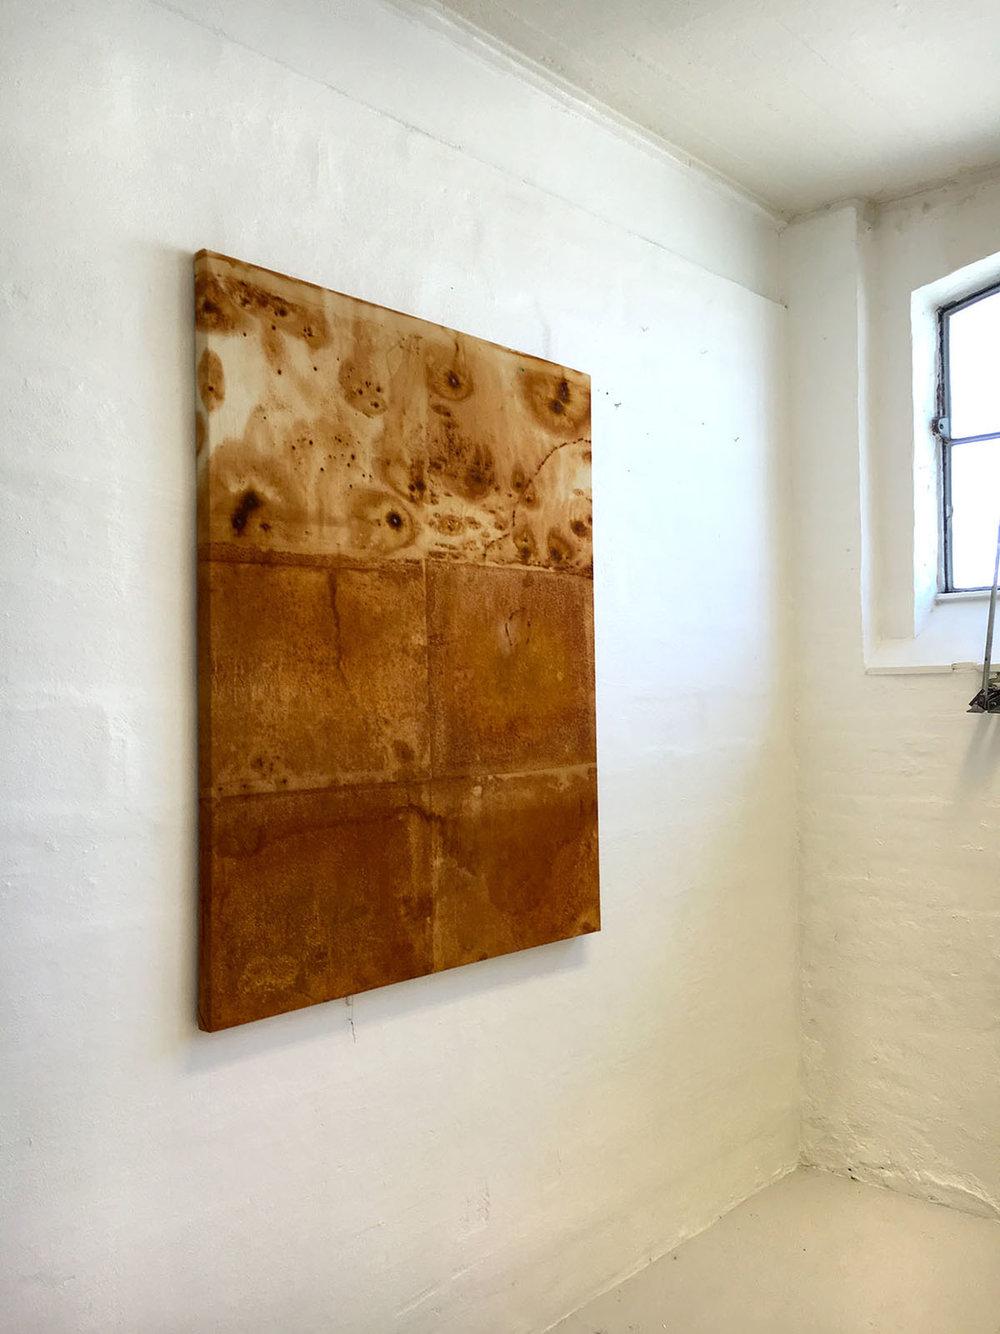 Kristian Jon Larsen, Rust1, 120 x 140 cm, 2016.